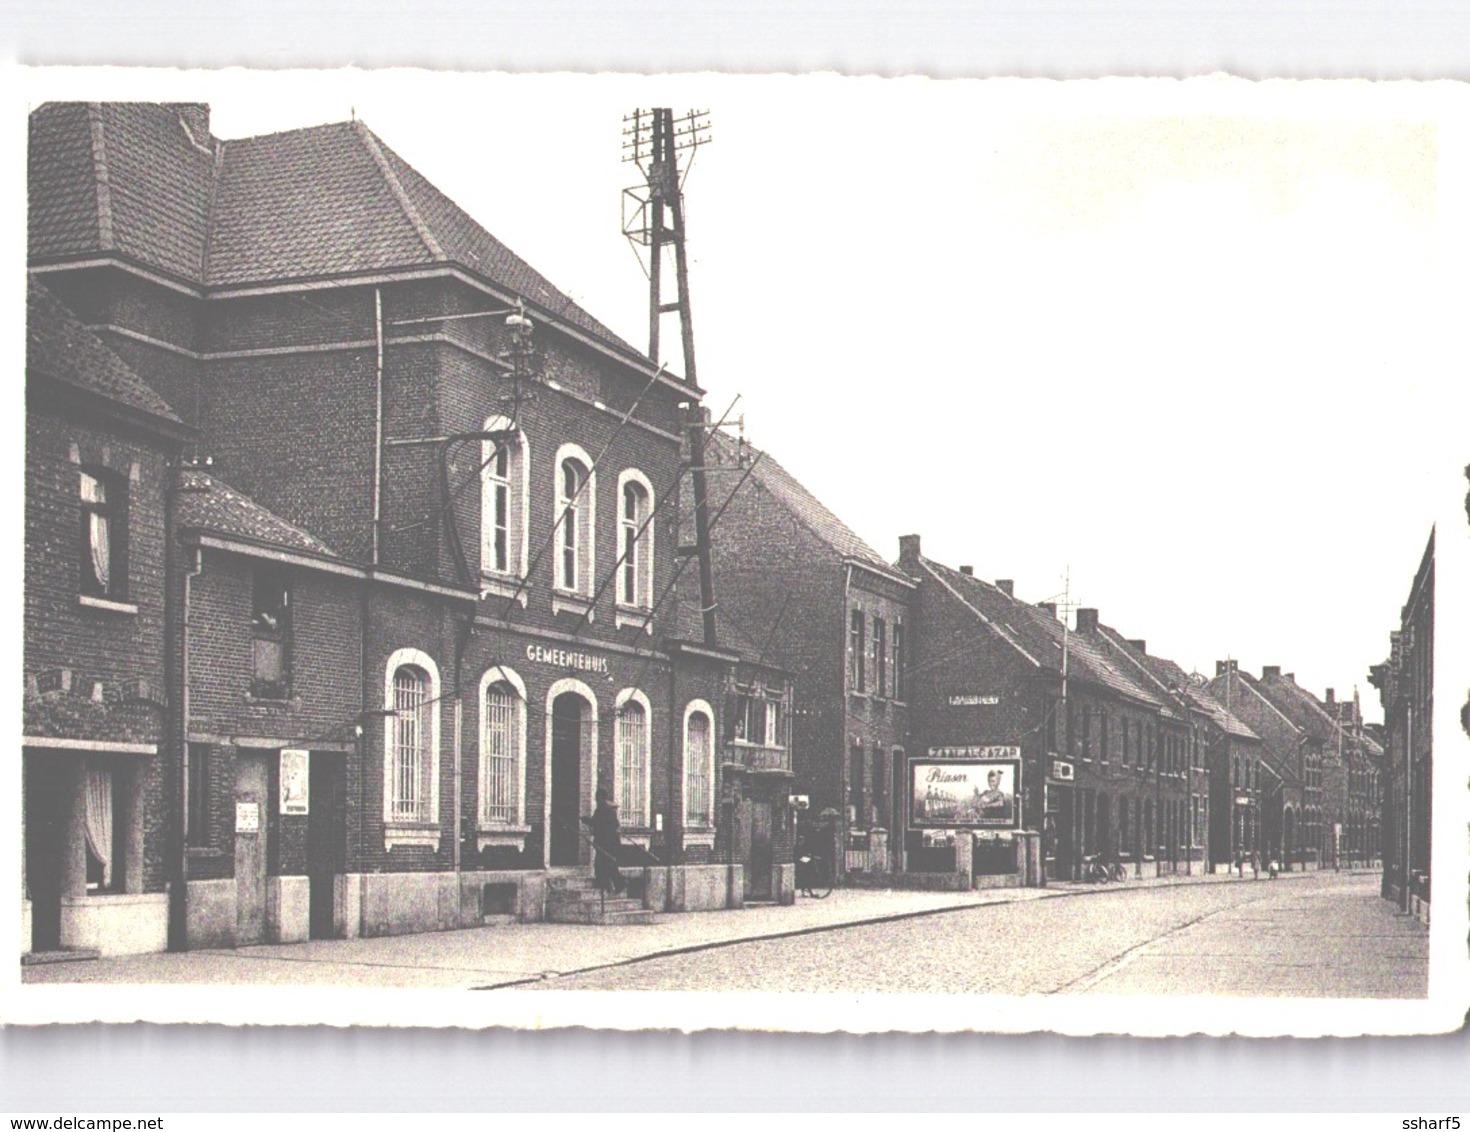 2 Stk. Kapelle-op-den-Bos FABRIEK ETERNIT + GEMEENTEHUIS ZAAL ALCAZAR 1930'ies - Kapelle-op-den-Bos